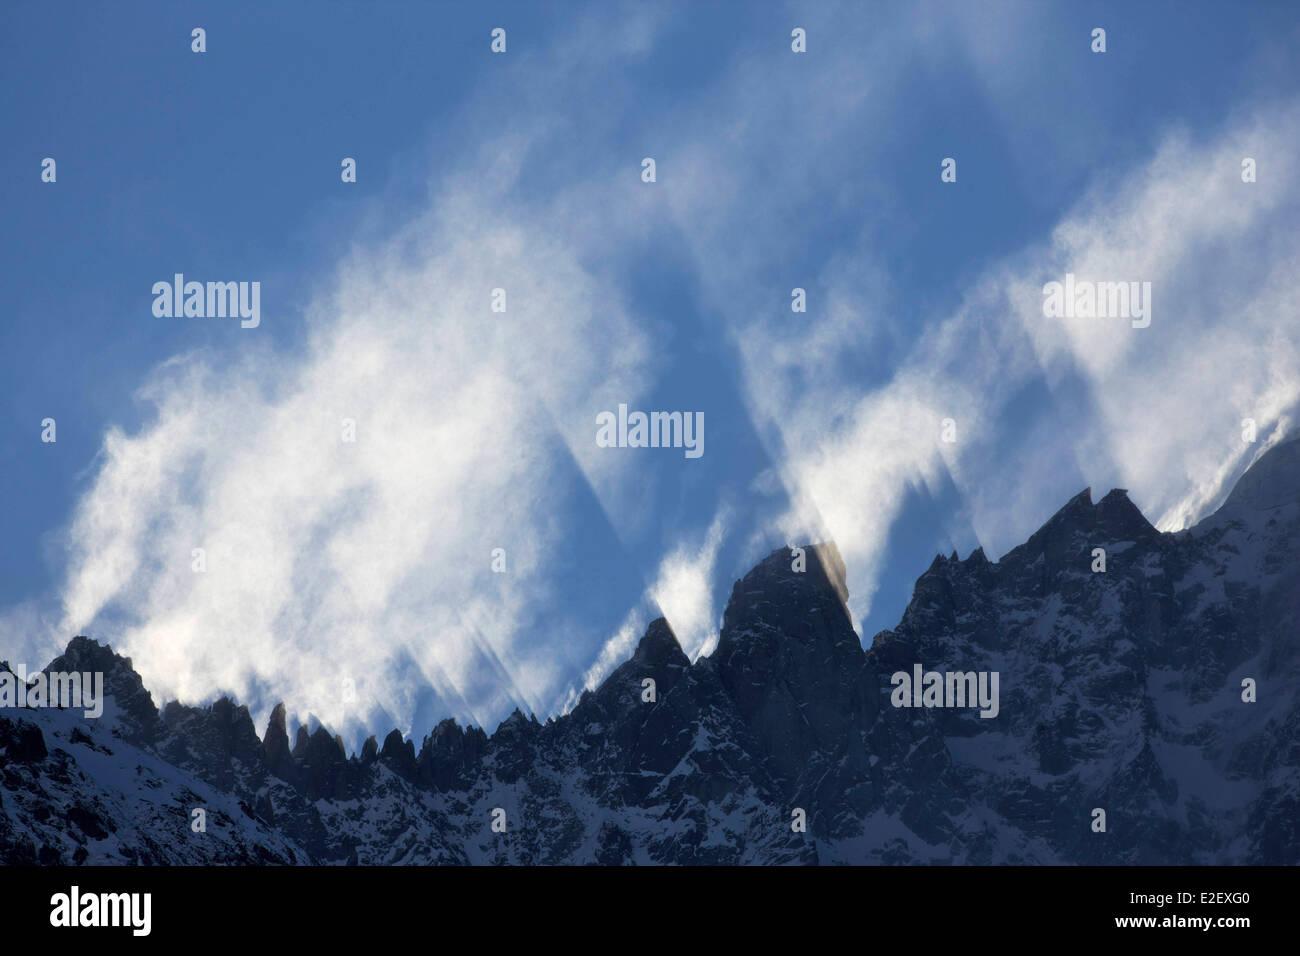 France, Haute Savoie, Chamonix, clouds movements on the Grands Montets ridge, Chamonix valley - Stock Image